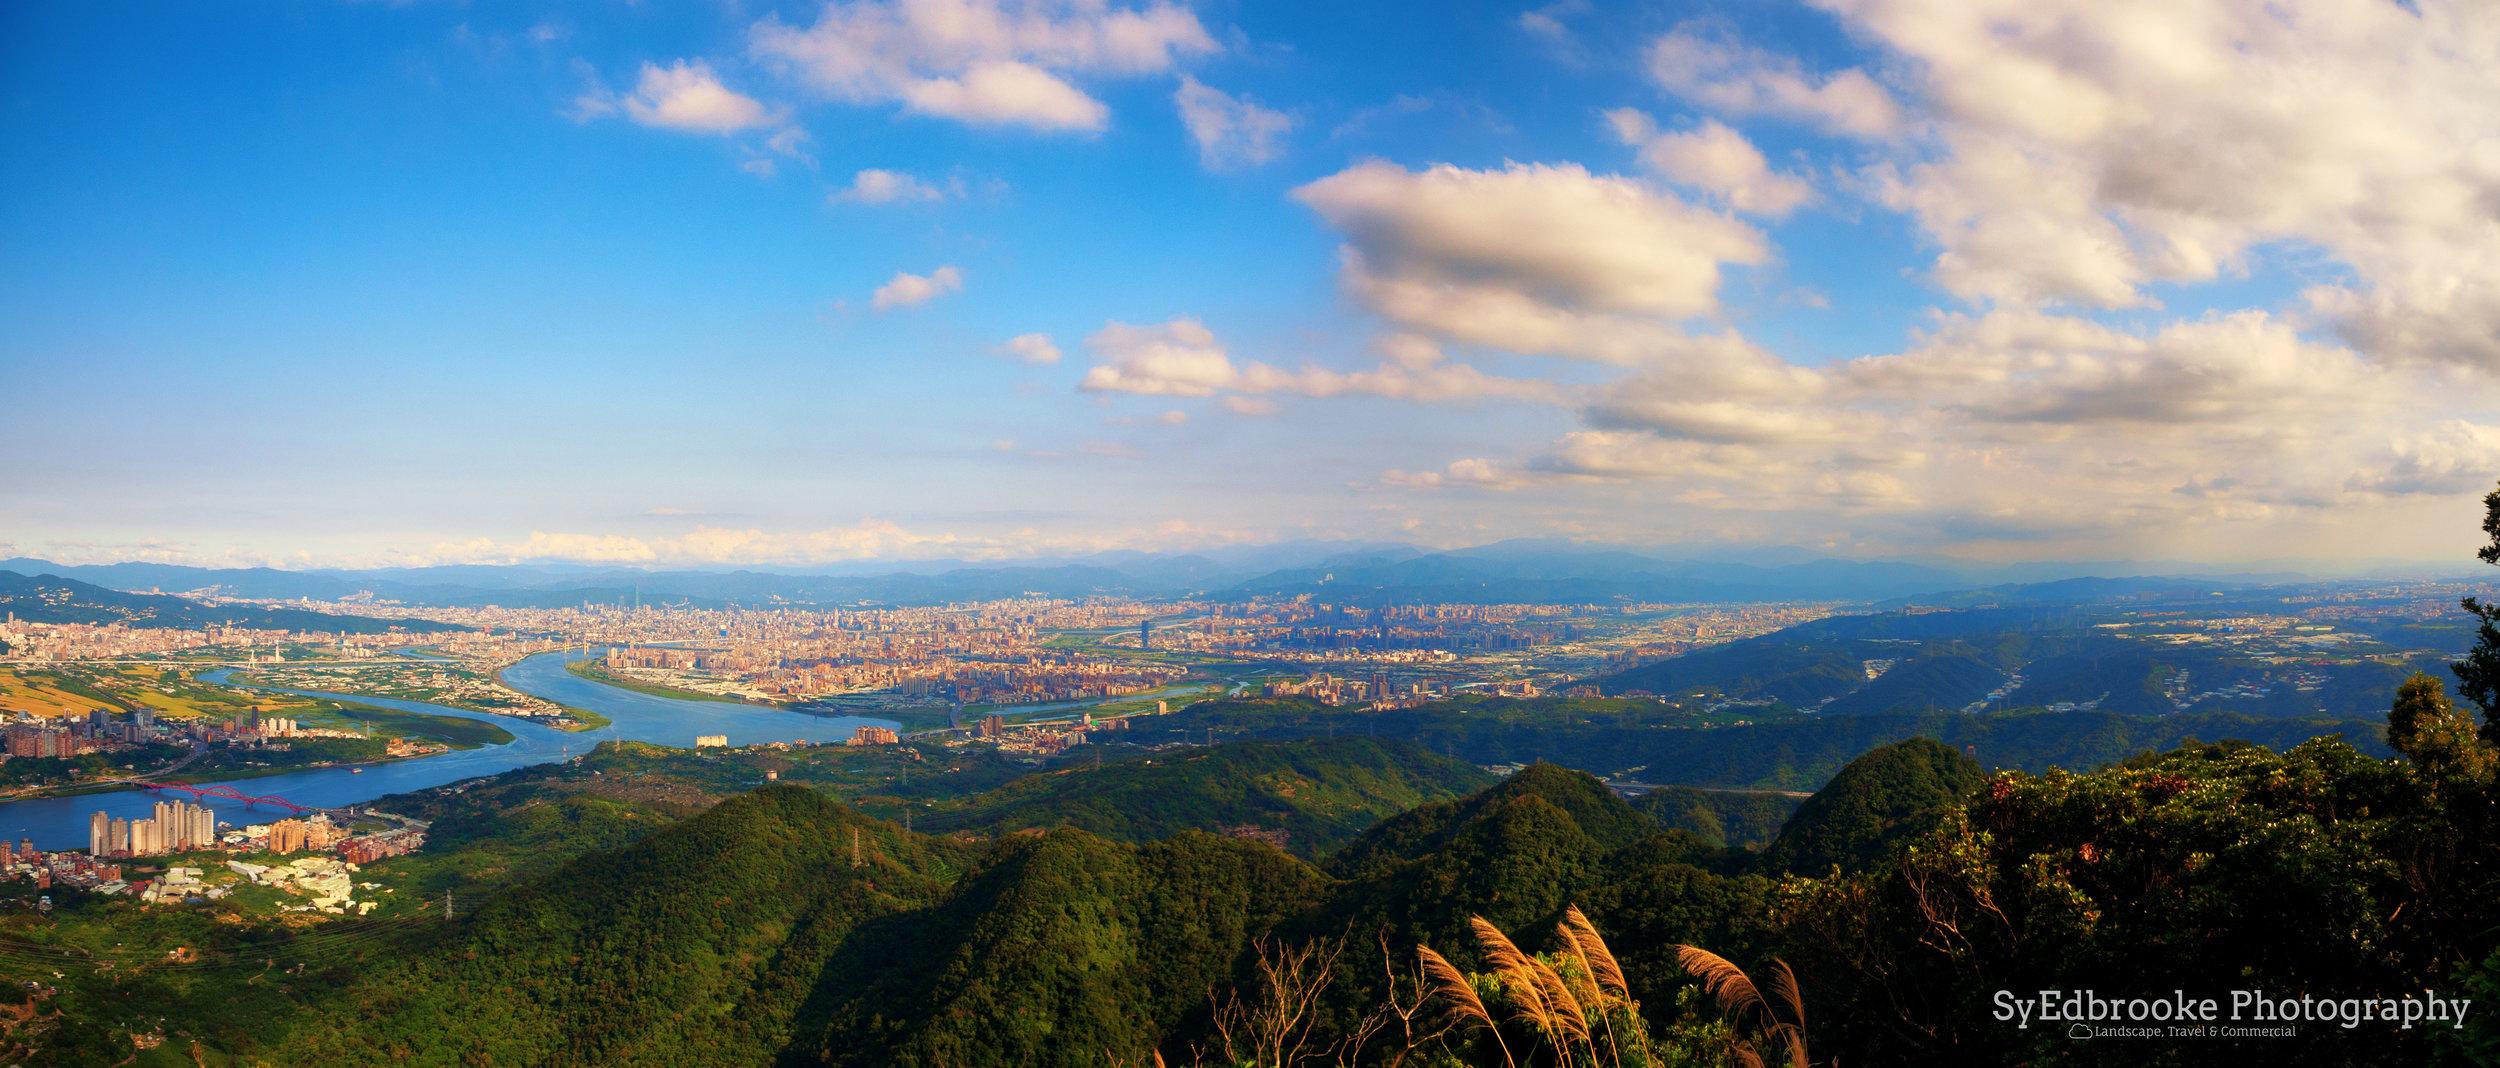 A panoramic shot of Taipei City & New Taipei. f5.6, ISO 200 , 1/500,24mm